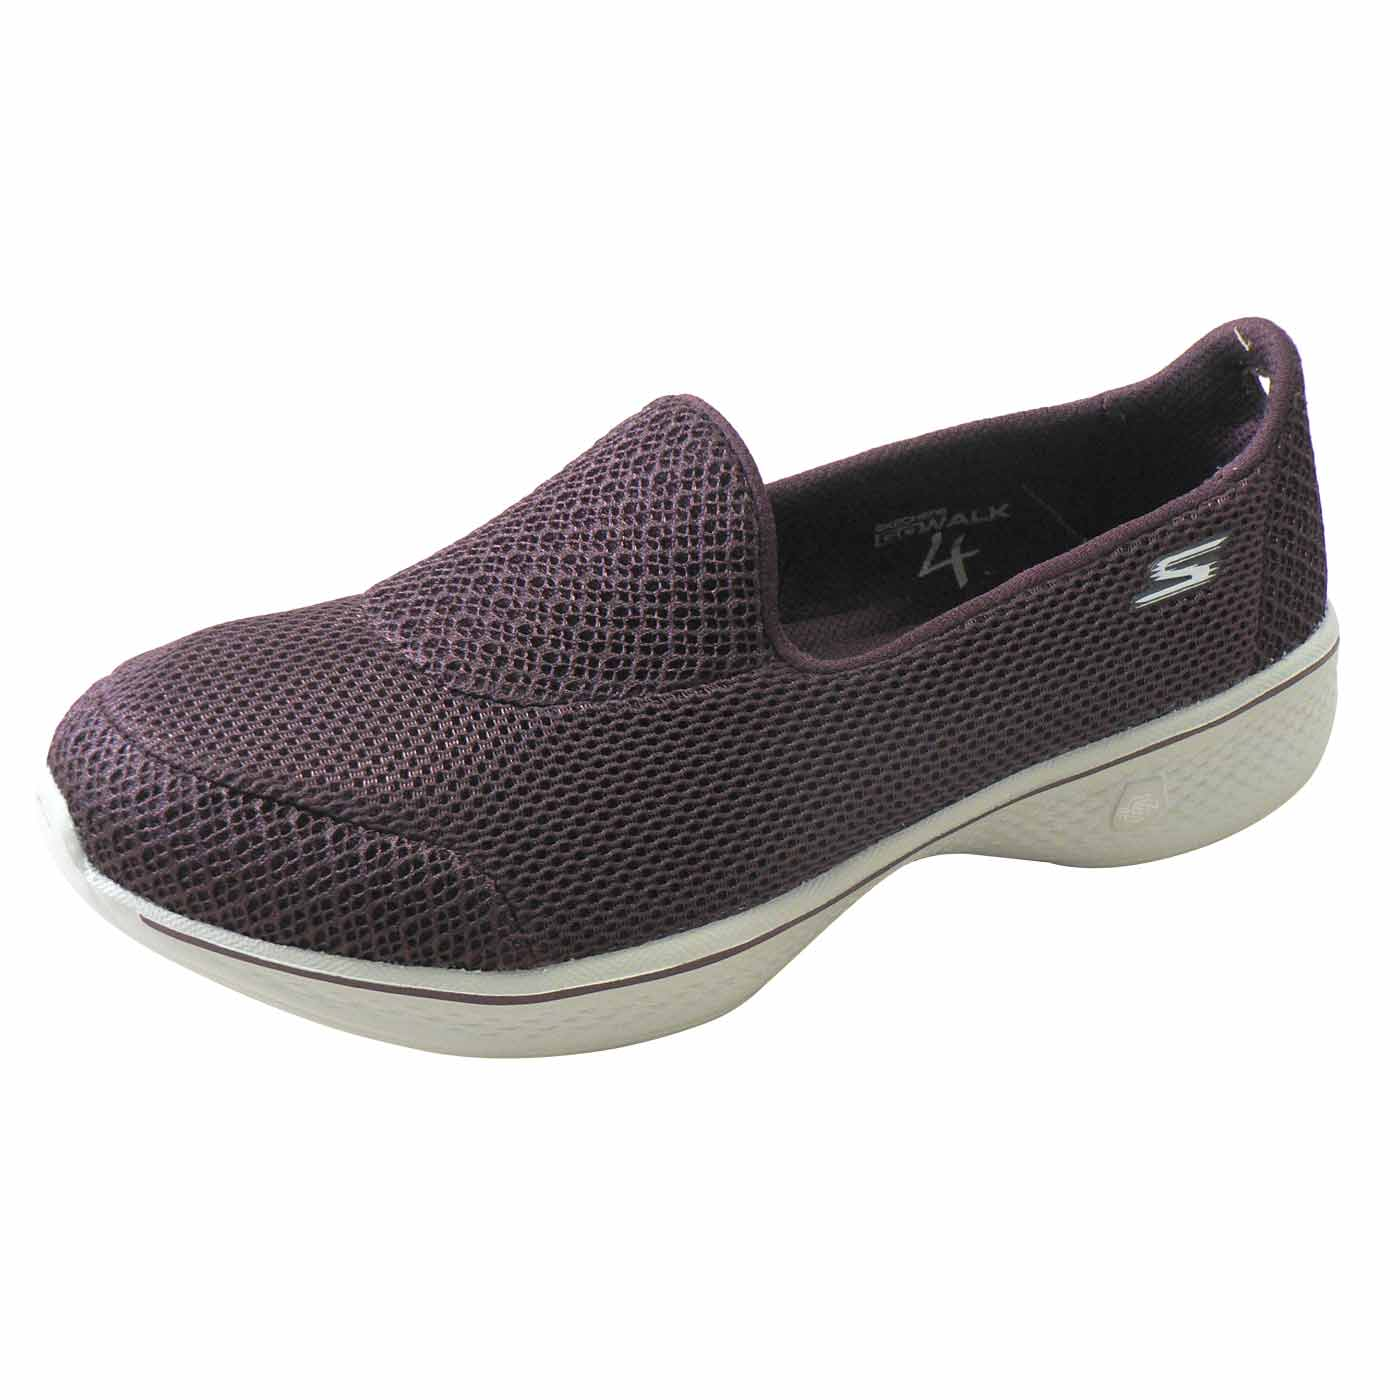 e4aa6428c8cf4 Go Walk 4 14170 - Dark Purple